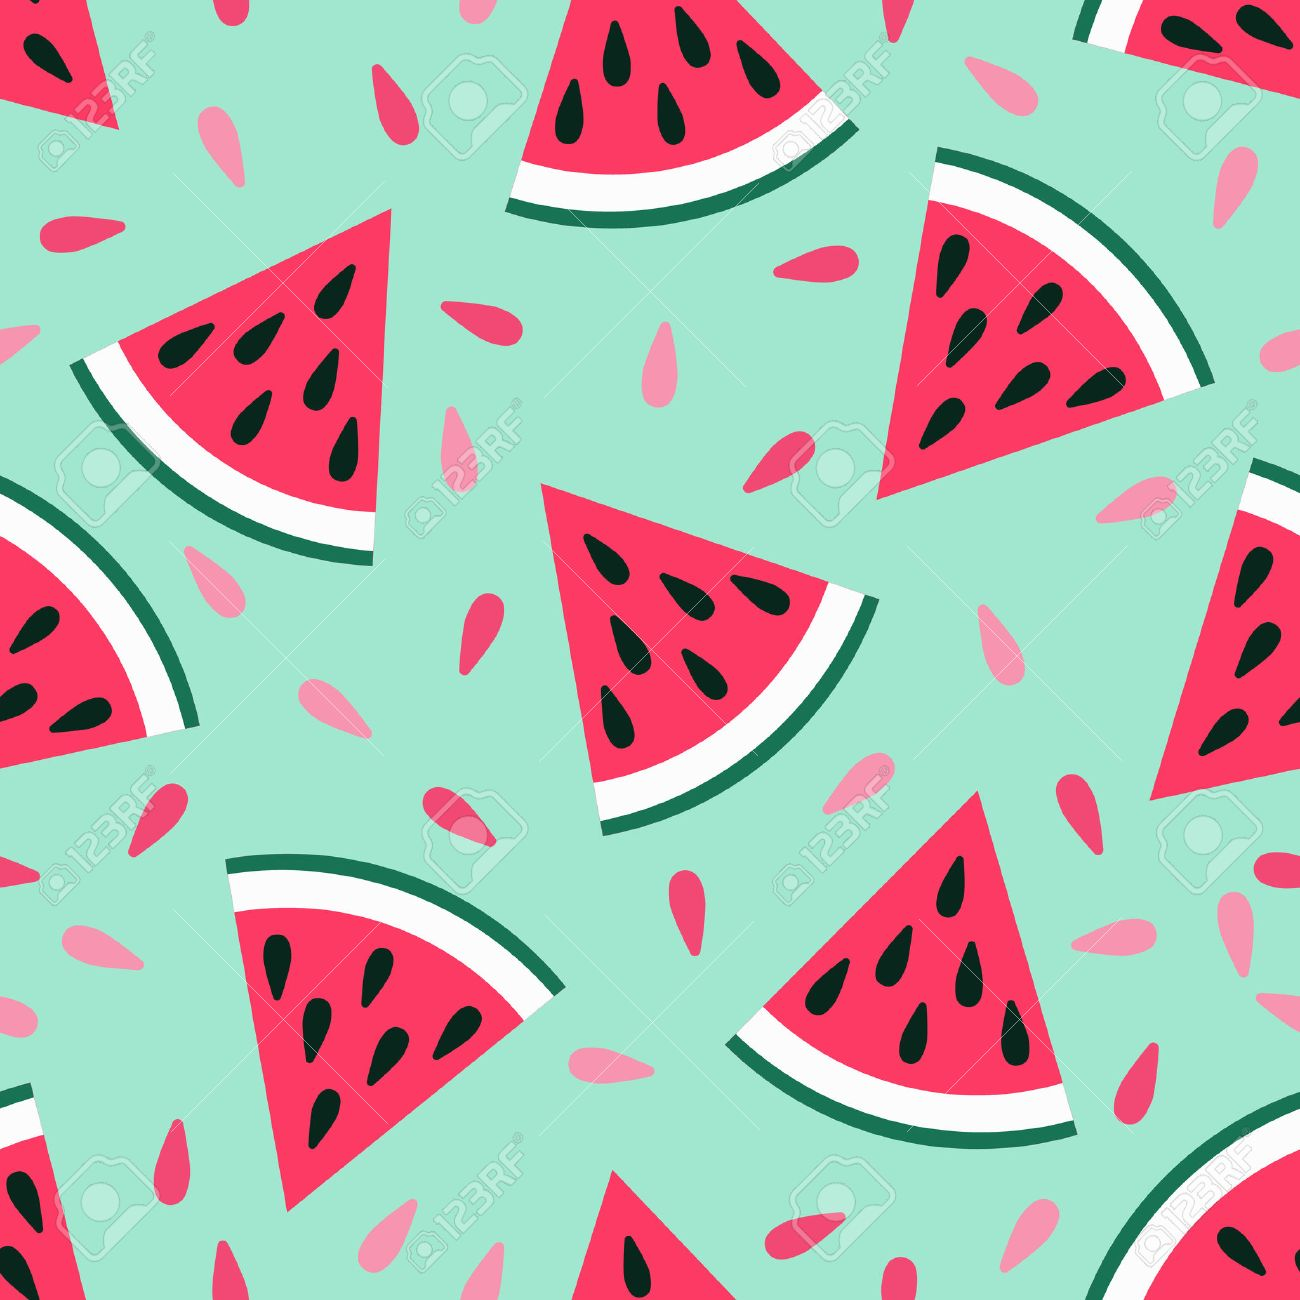 Cute seamless watermelon pattern on blue background. Vector illustration for sweet summer fruit design. Slice fresh food ornament. Pretty repeat wallpaper. Bright tasty cartoon decoration - 61828542